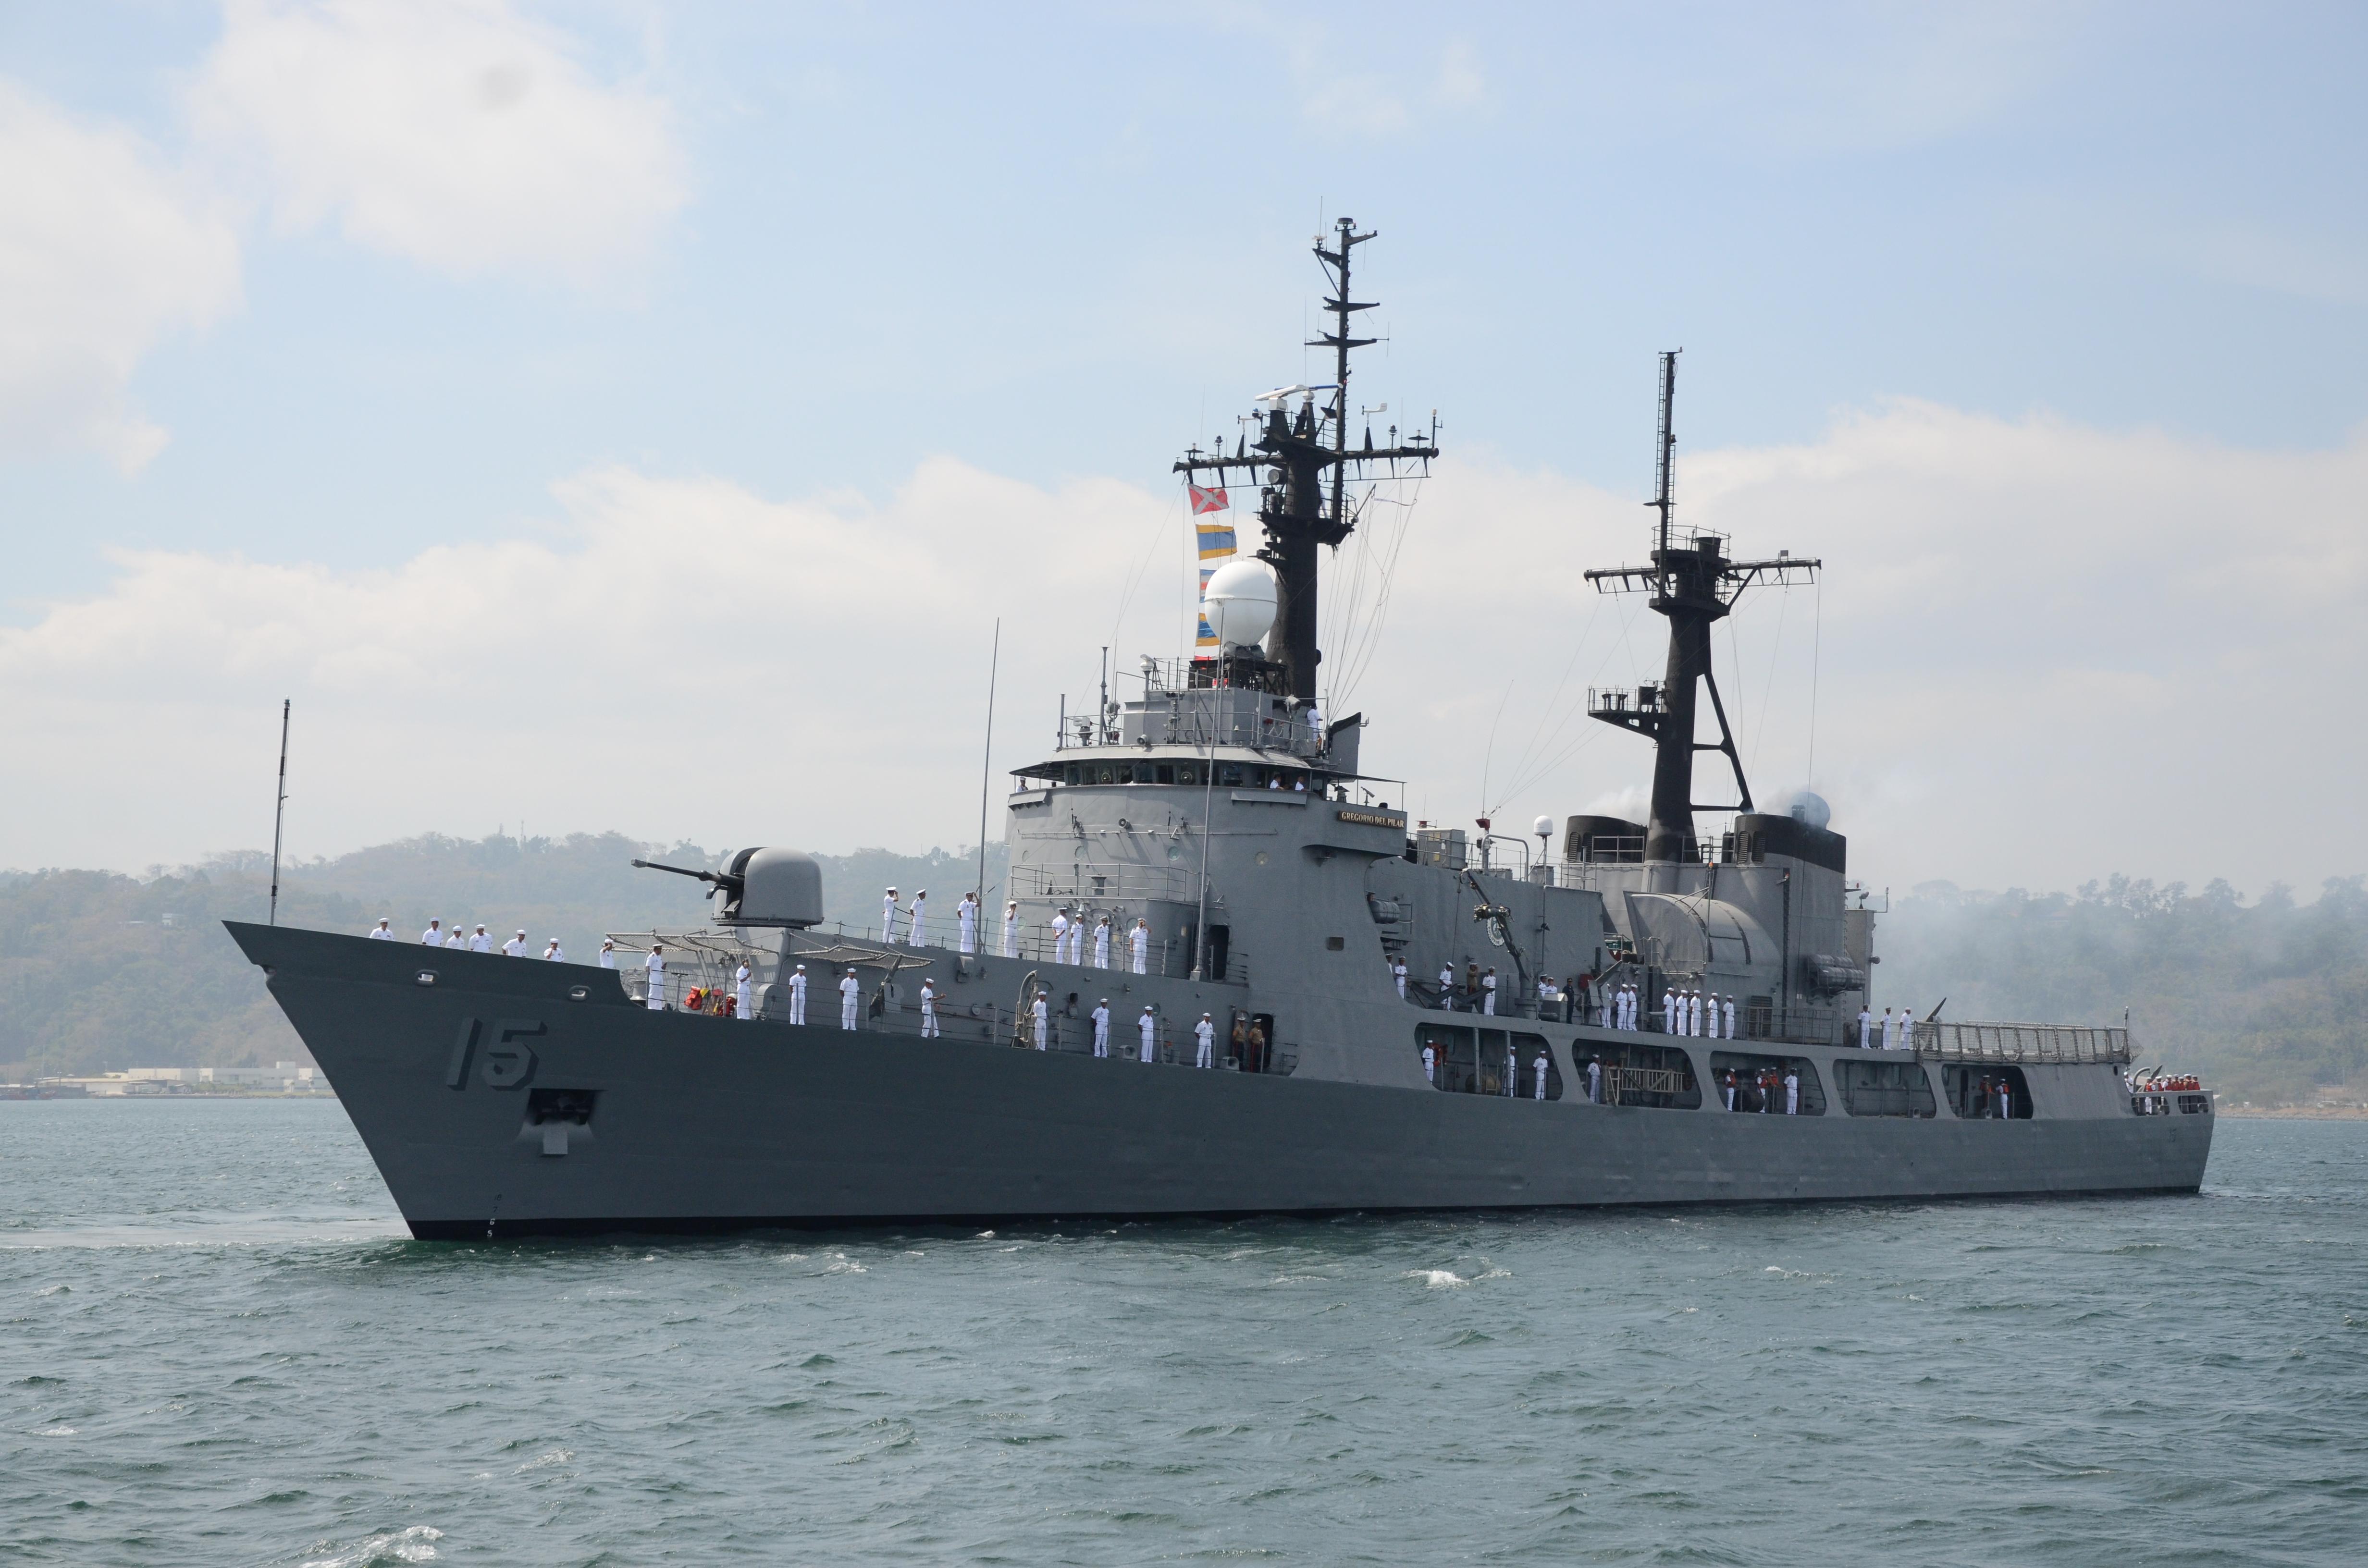 Pn Sends Gregorio Del Pilar For Naval Exercise In